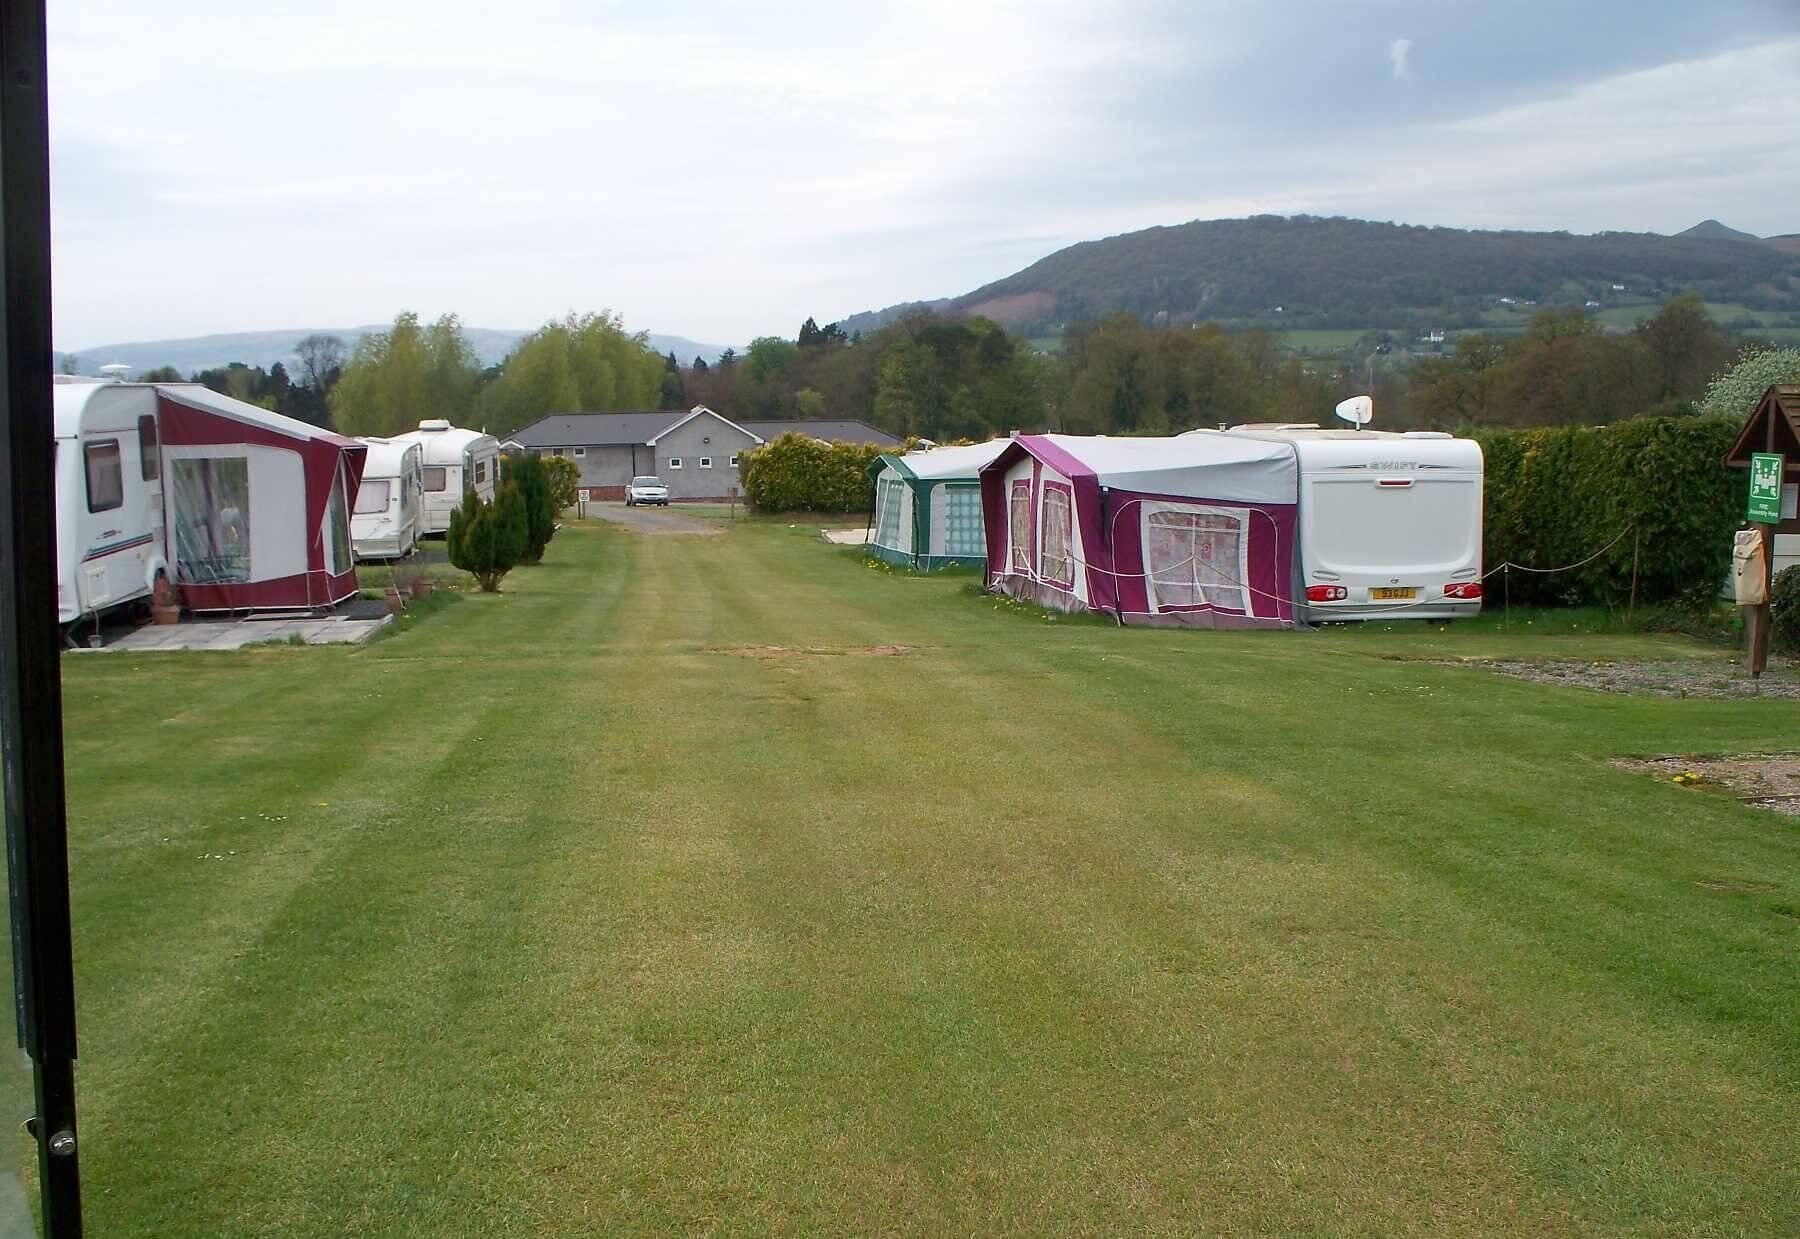 Wernddu Farm Caravan Park, Abergavenny, Monmouthshire | Head Outside